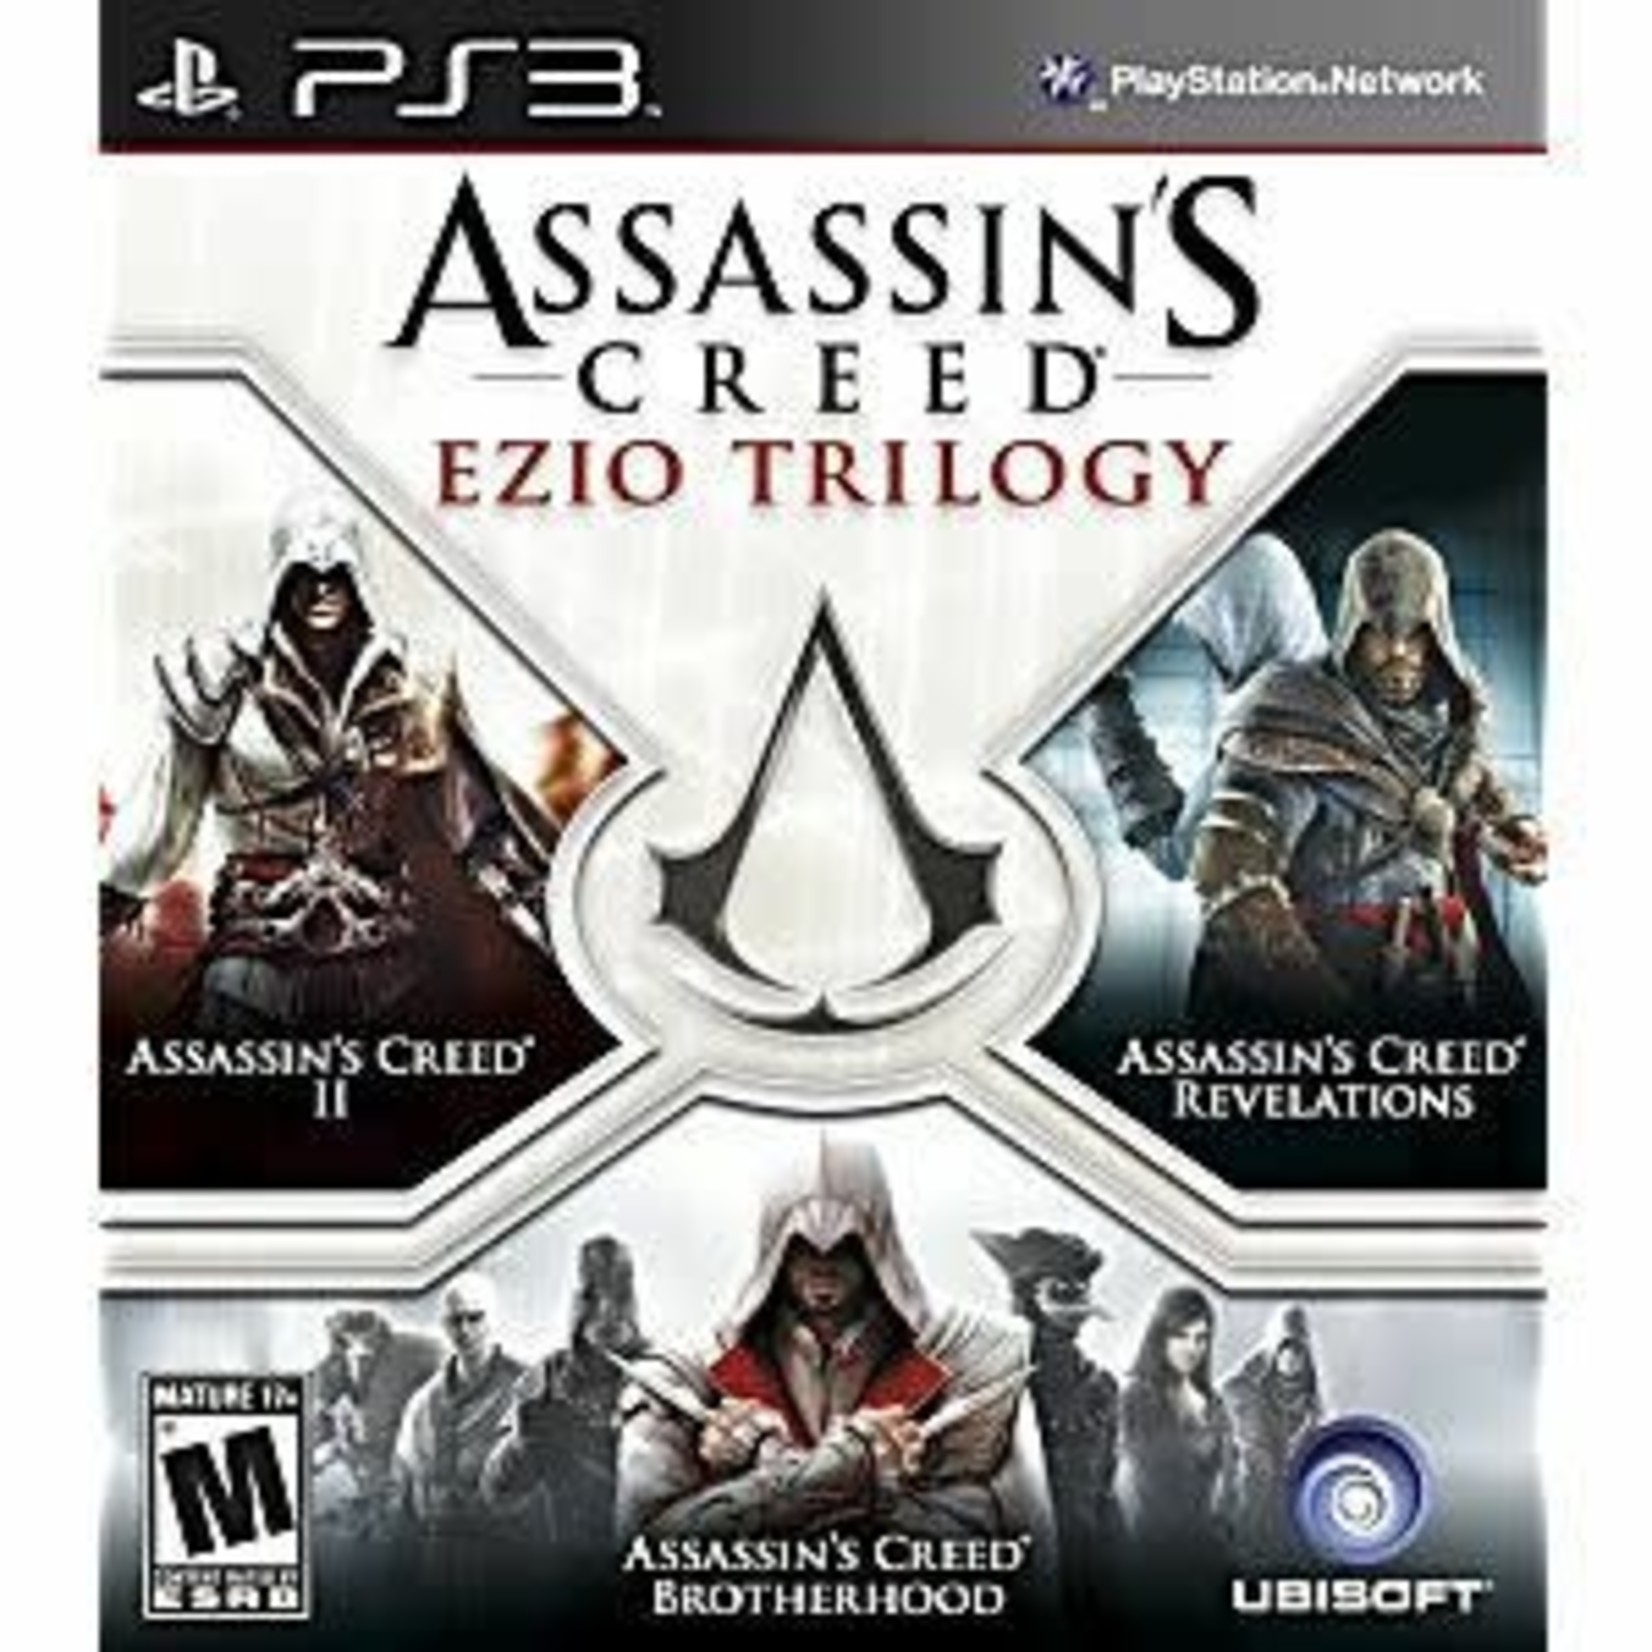 PS3U-Assassin's Creed Ezio Trilogy